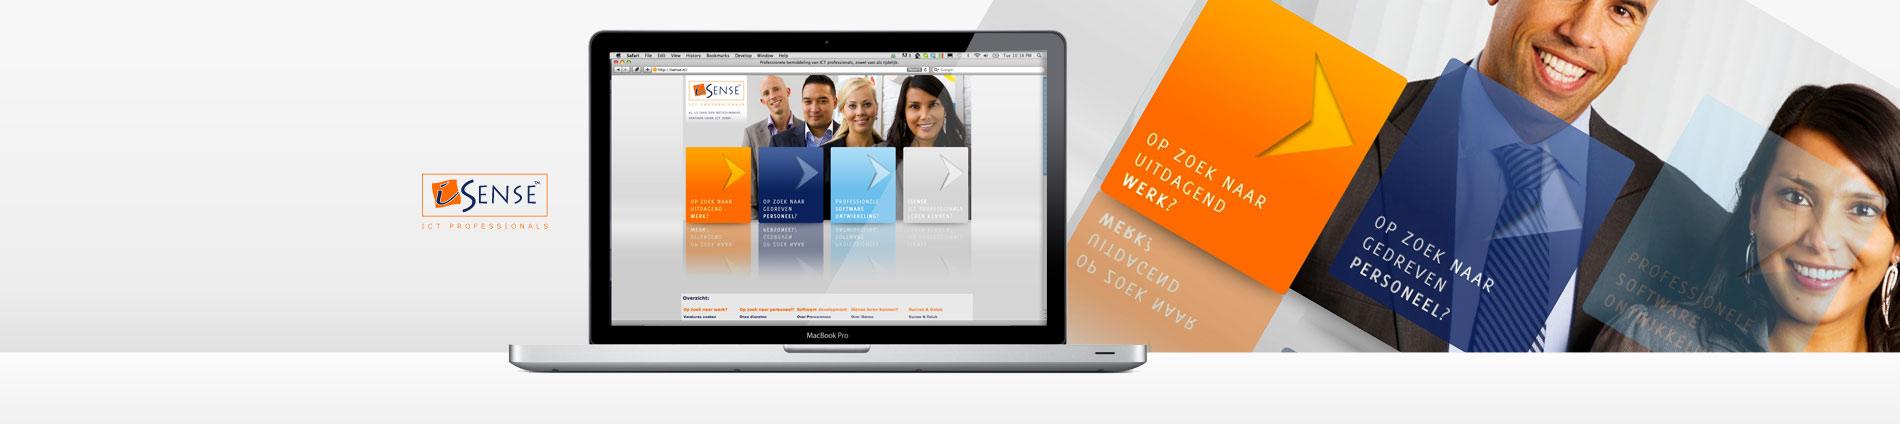 website laten maken, webdesign, webdevelopment, wordpress website